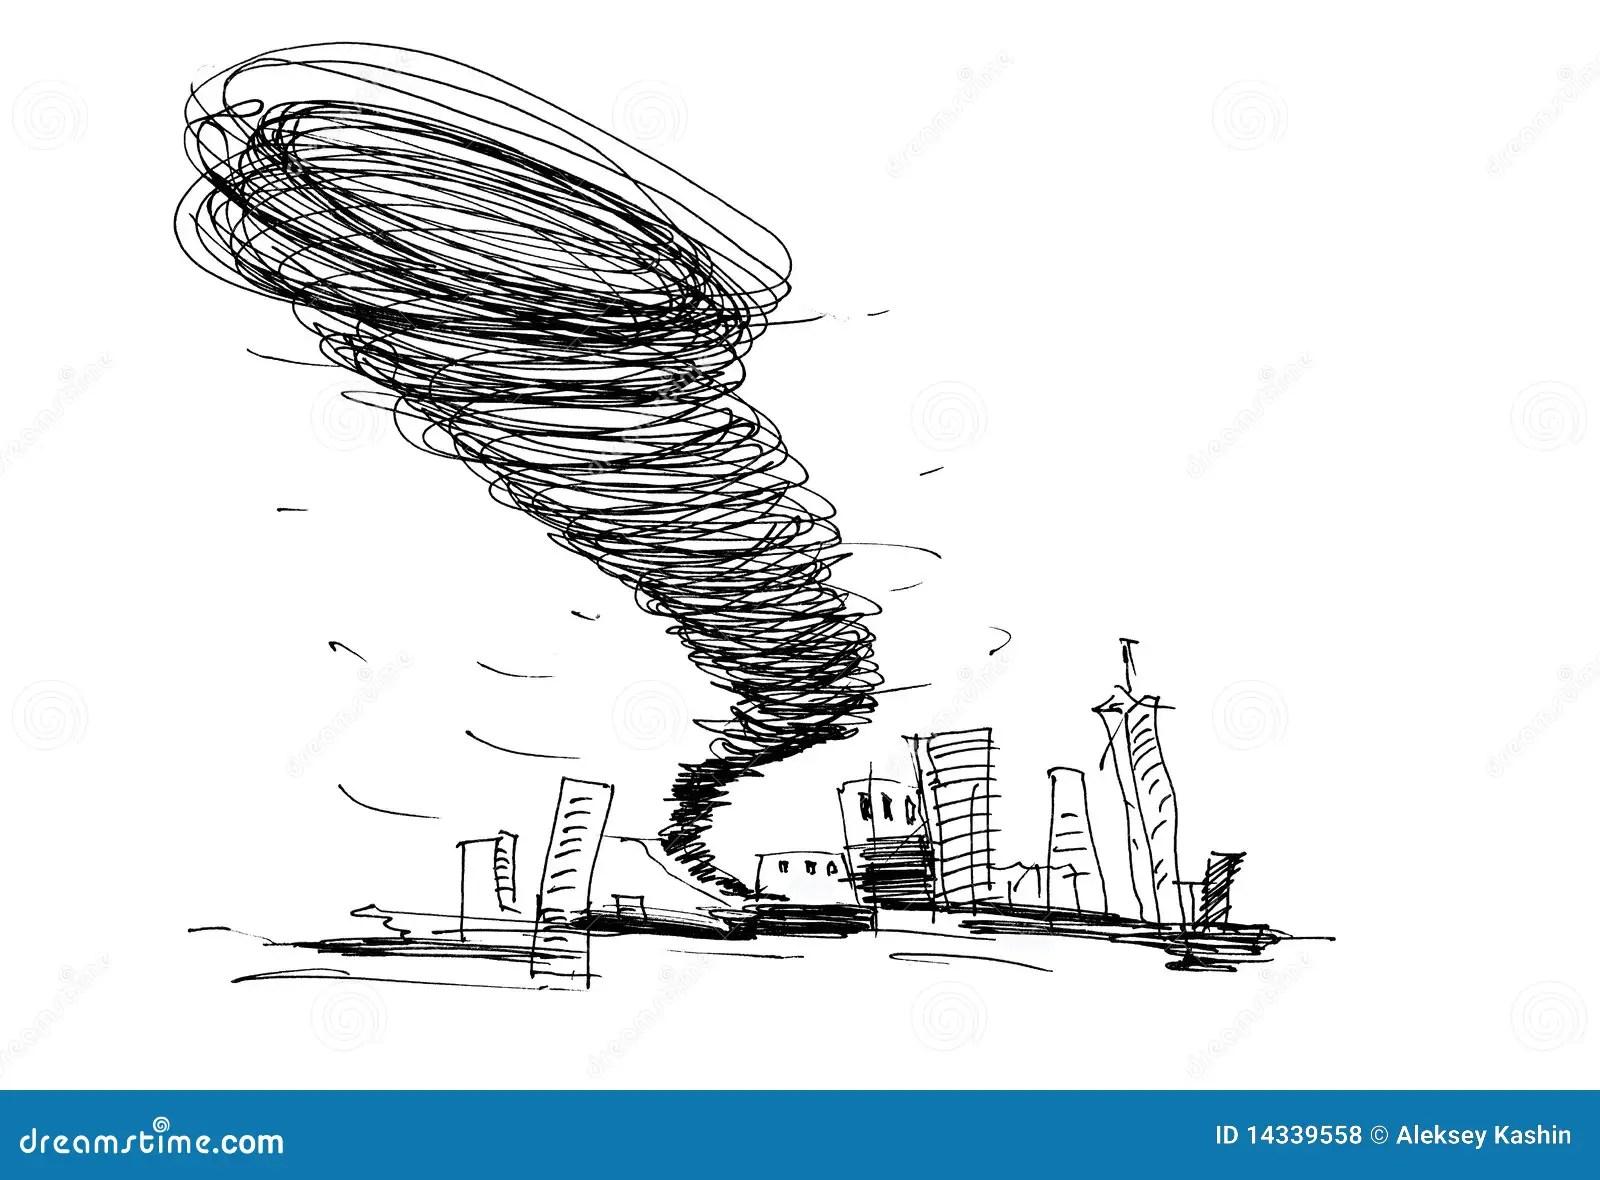 Sketch of the hurricane stock illustration. Illustration